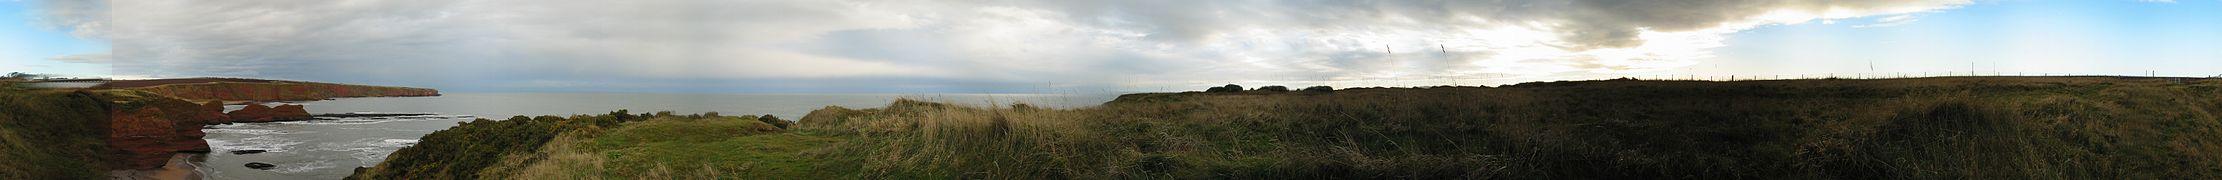 Arbroath Cliff Panorama.JPG